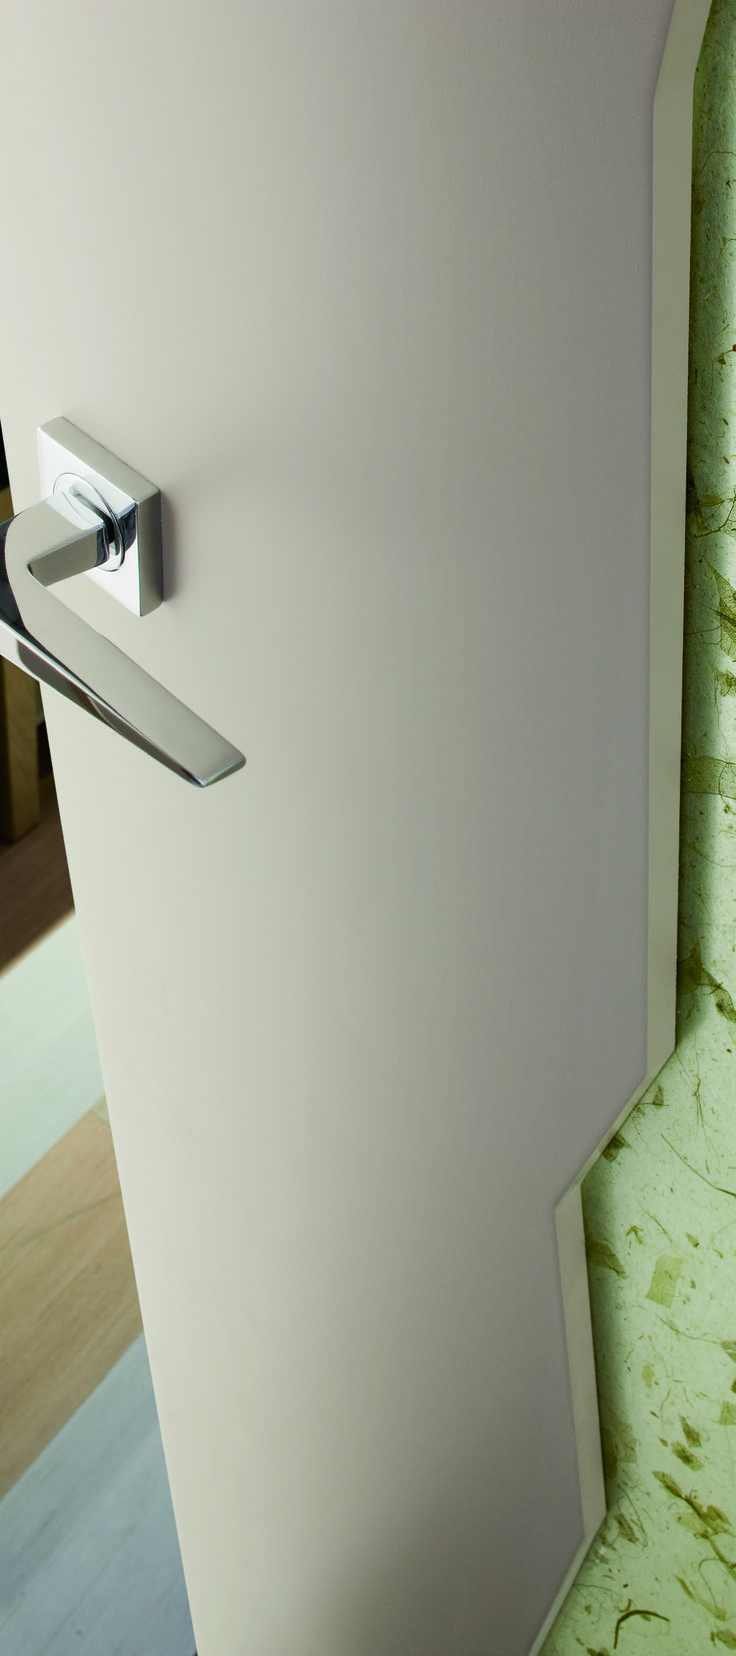 Bold lines that combine strenght and serenity. #handle #design #interiordesign #doors #home